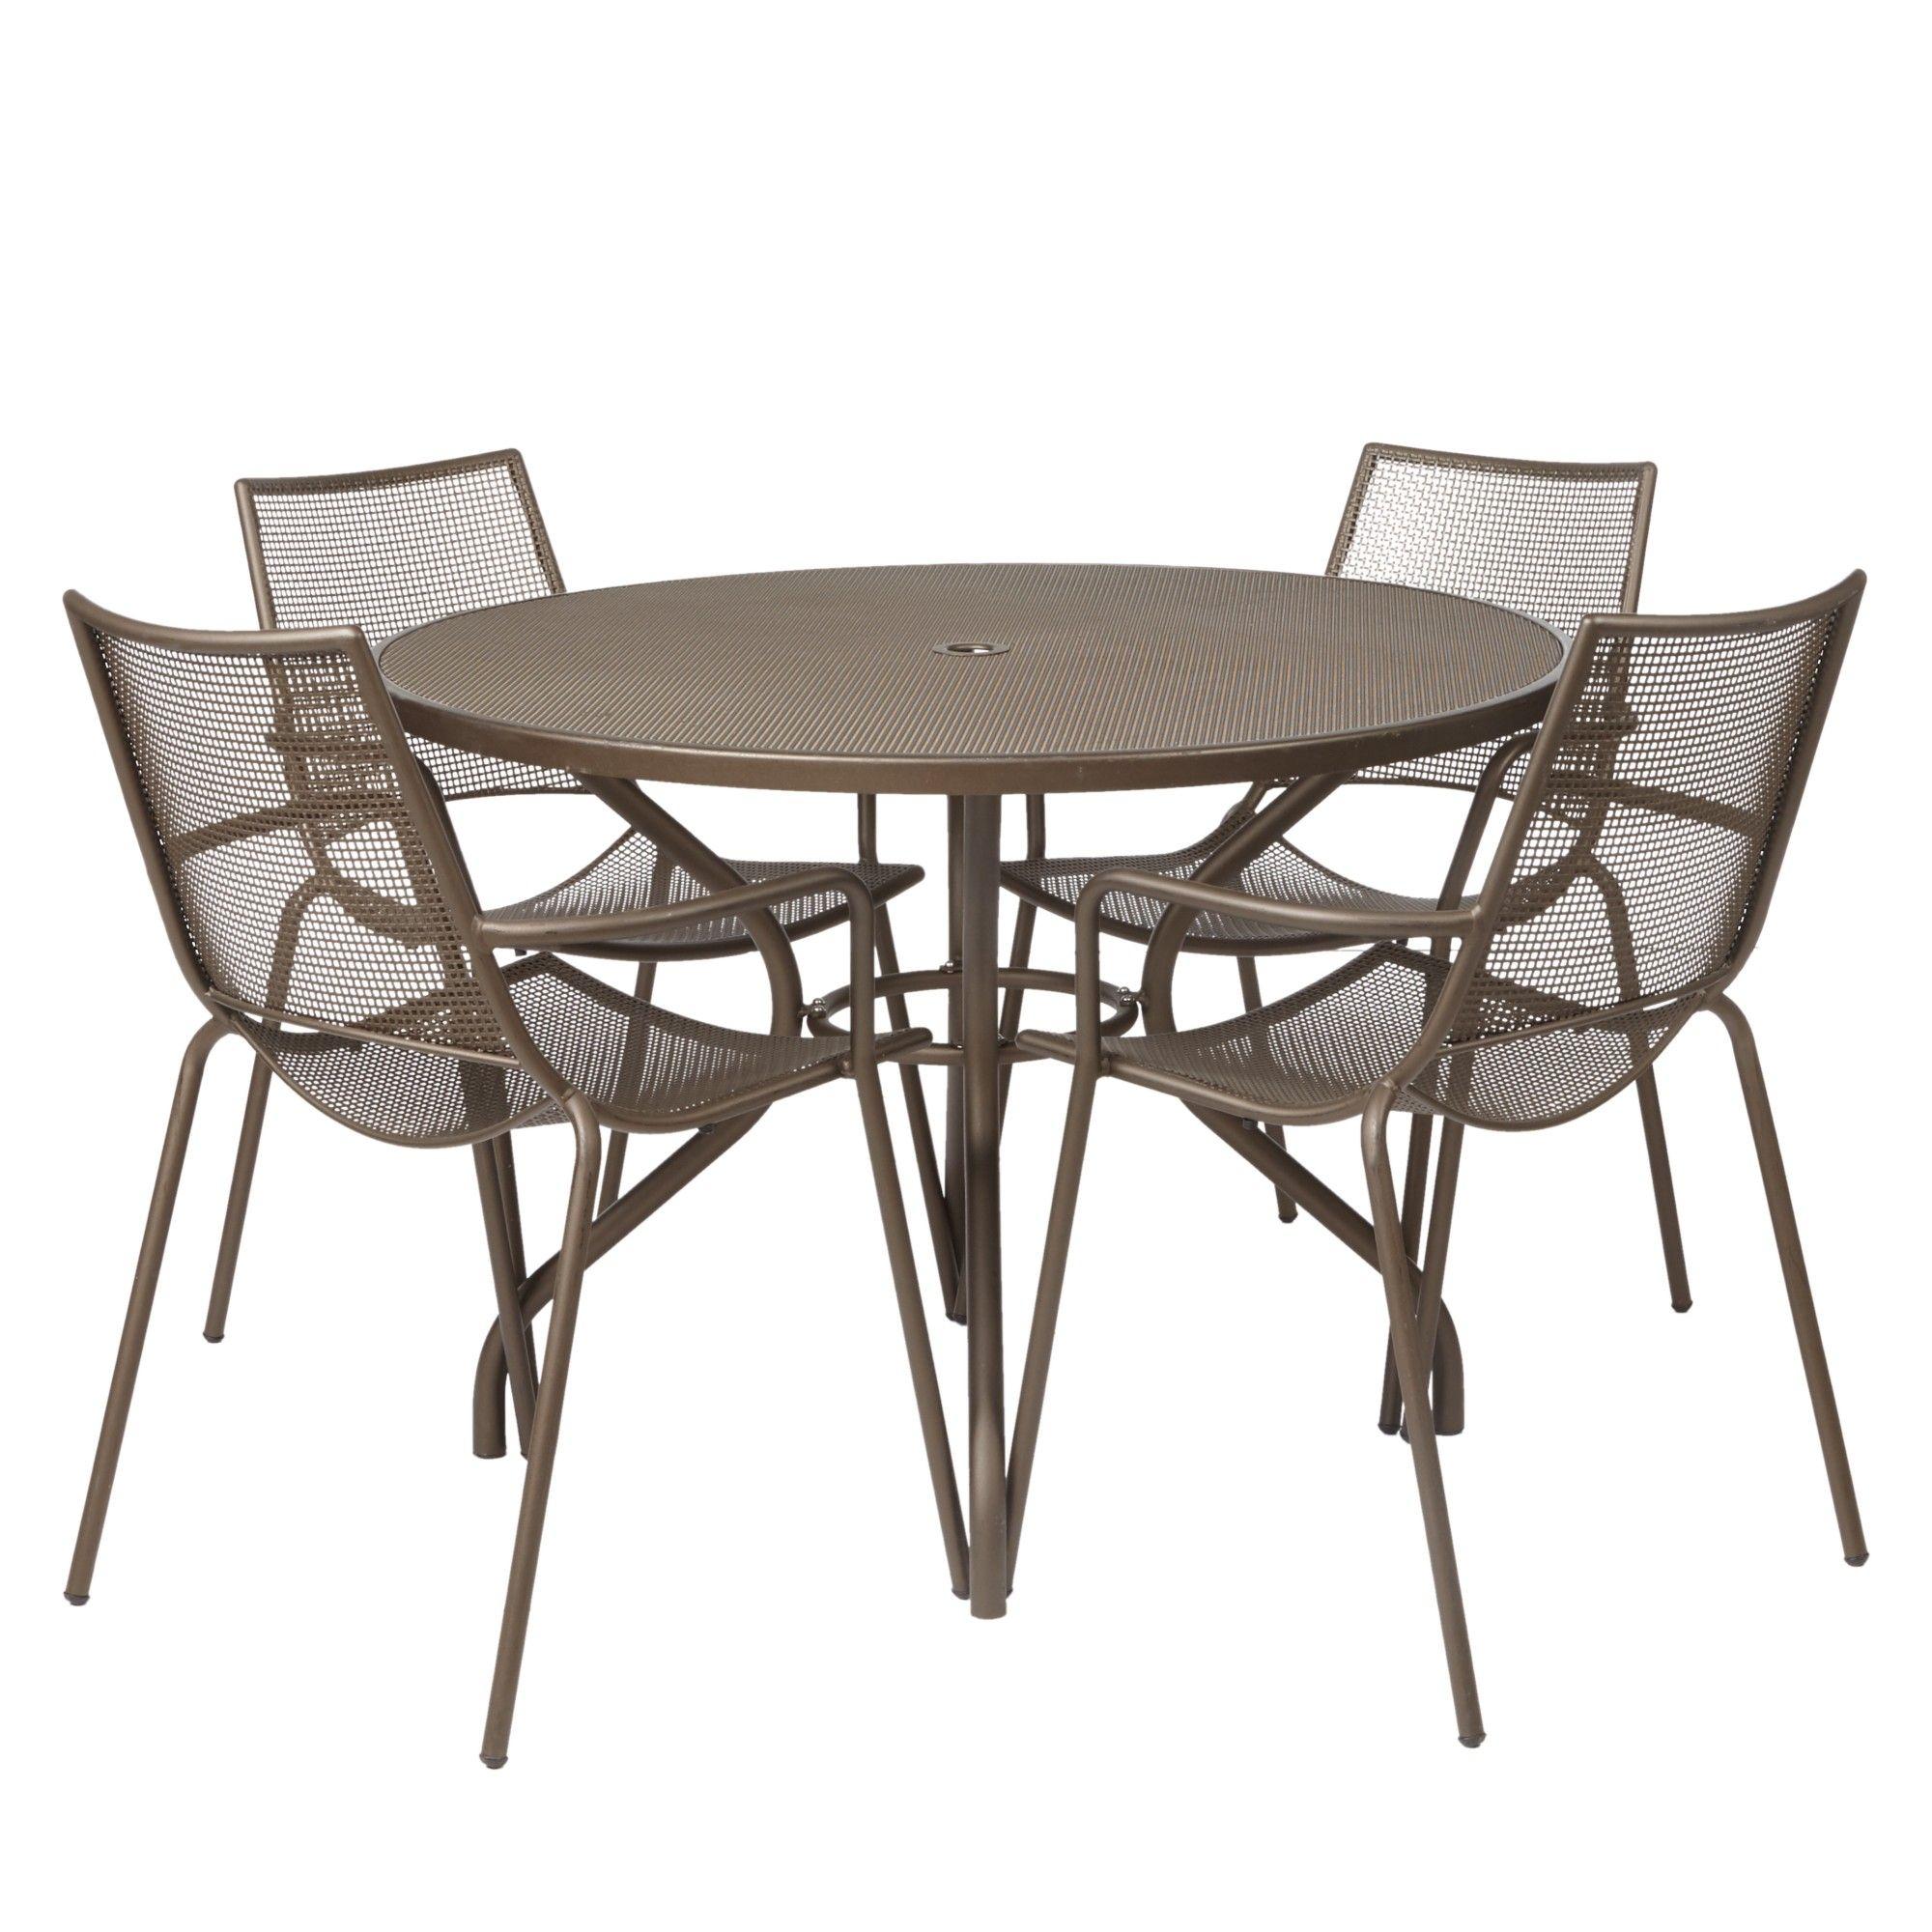 EMU Ala Mesh 4 Seater Outdoor Dining Set  Bronze  499. EMU Ala Mesh 4 Seater Outdoor Dining Set  Bronze  499   Garden